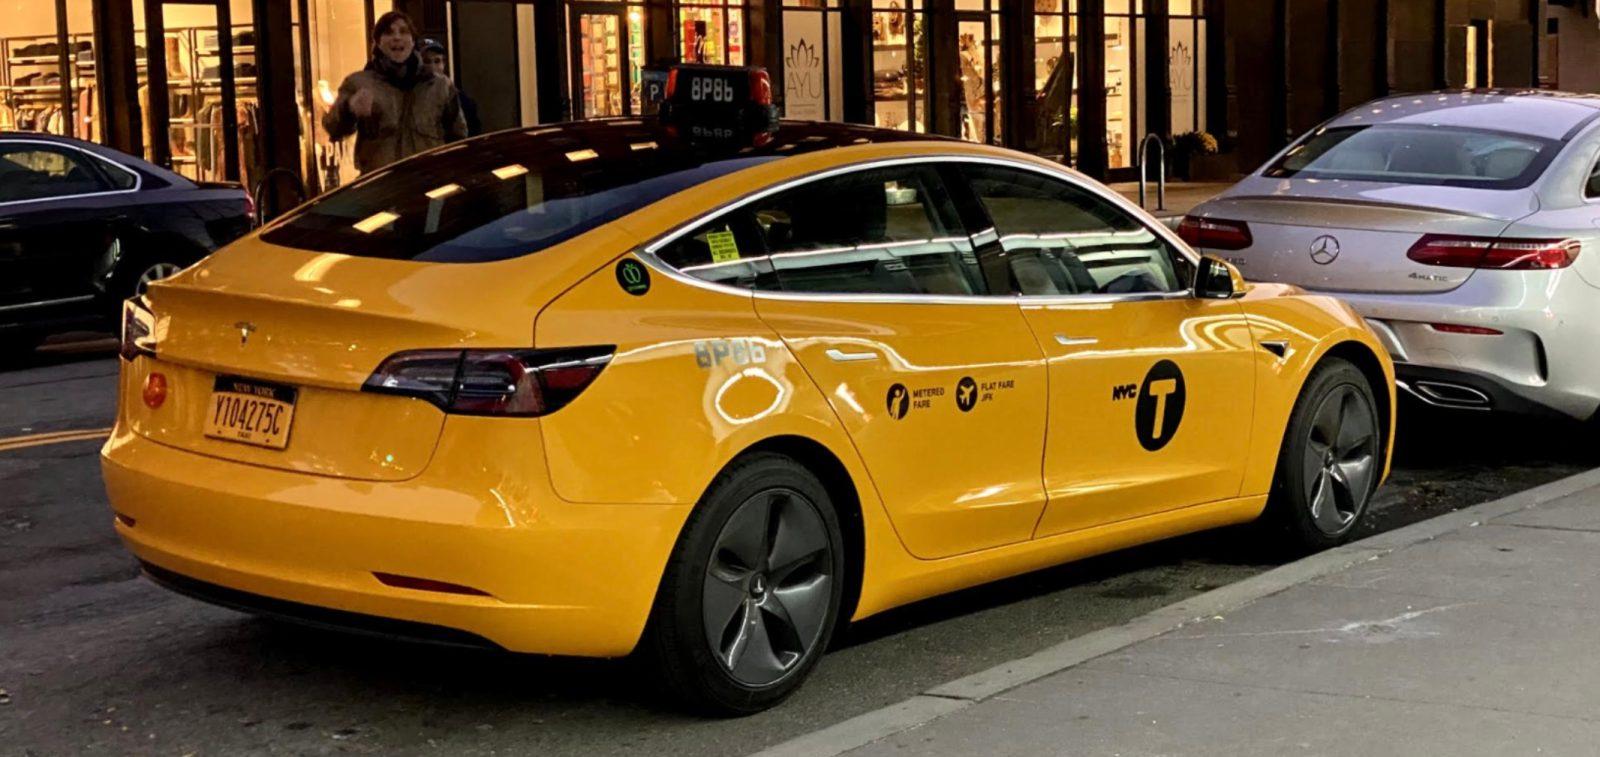 First Tesla Model 3 NYC yellow cab hits the road - Electrek